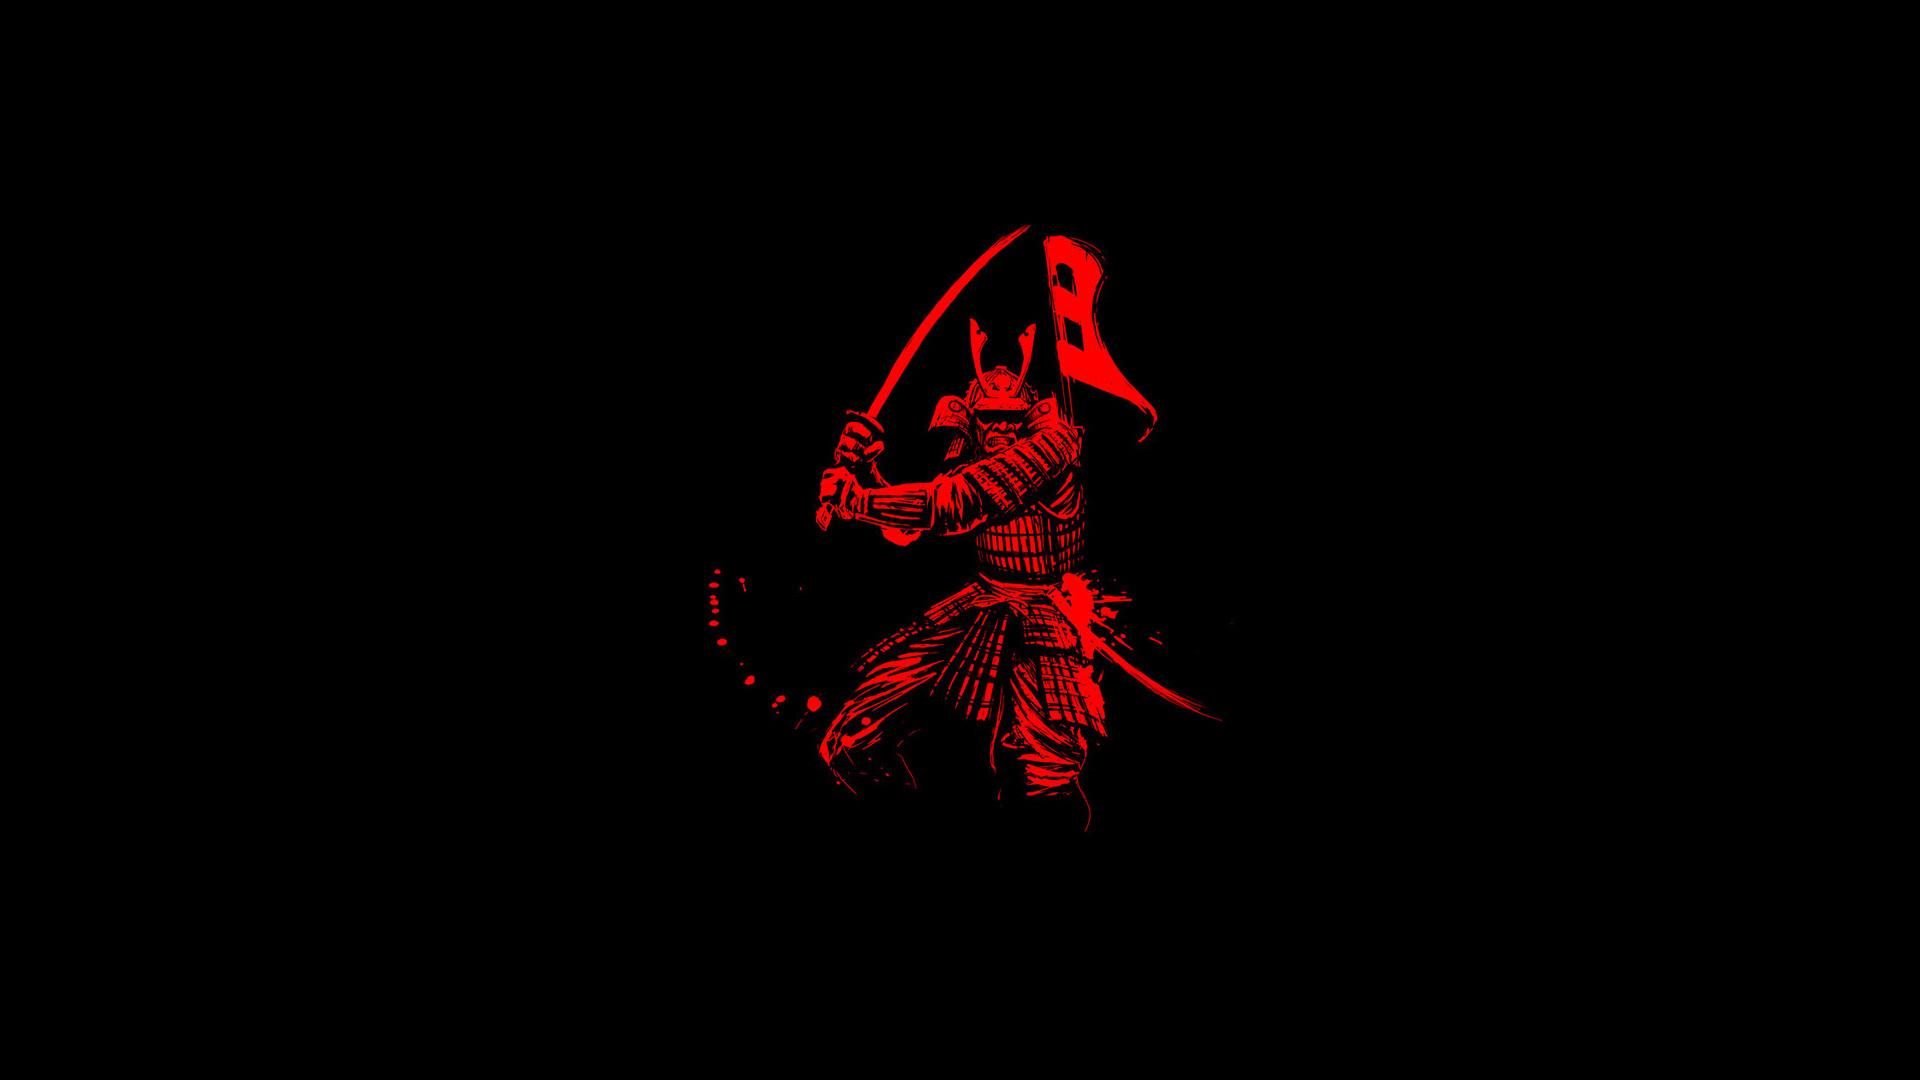 Samurai Wallpaper 1920x1080 (75+ images)